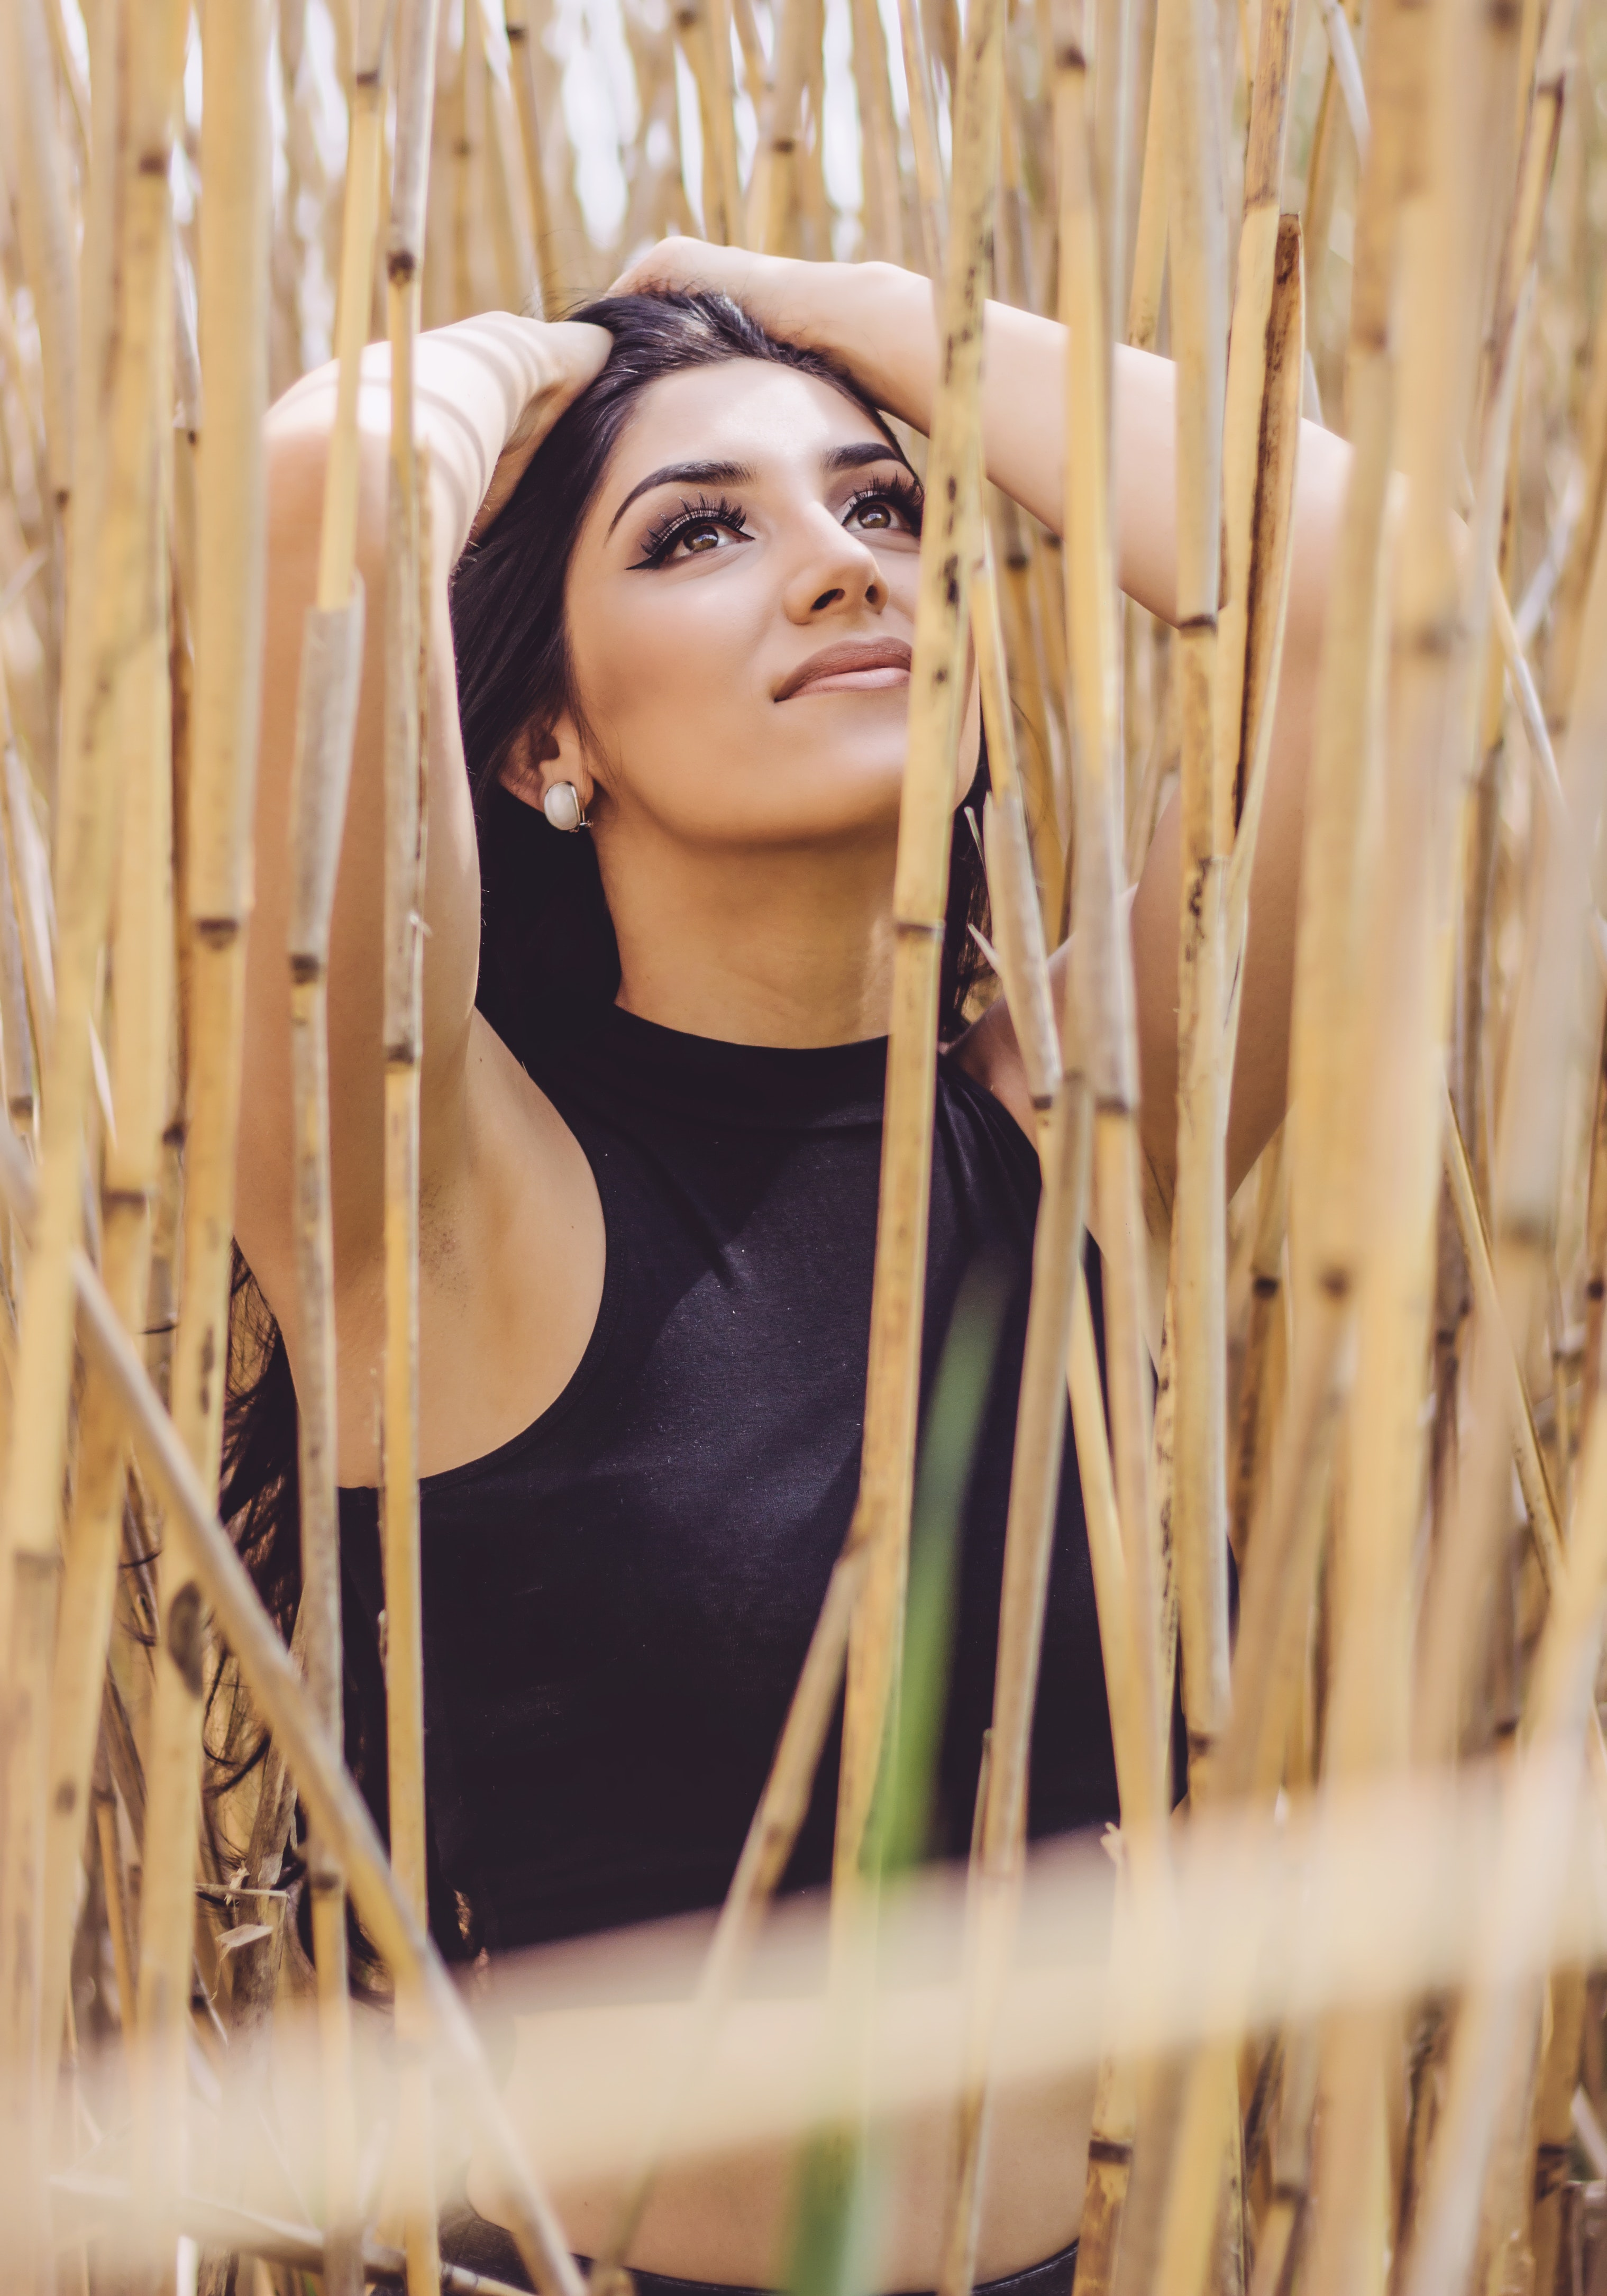 Woman Wearing Black Crop Top, Bamboo, Beautiful, Daytime, Eyes, HQ Photo